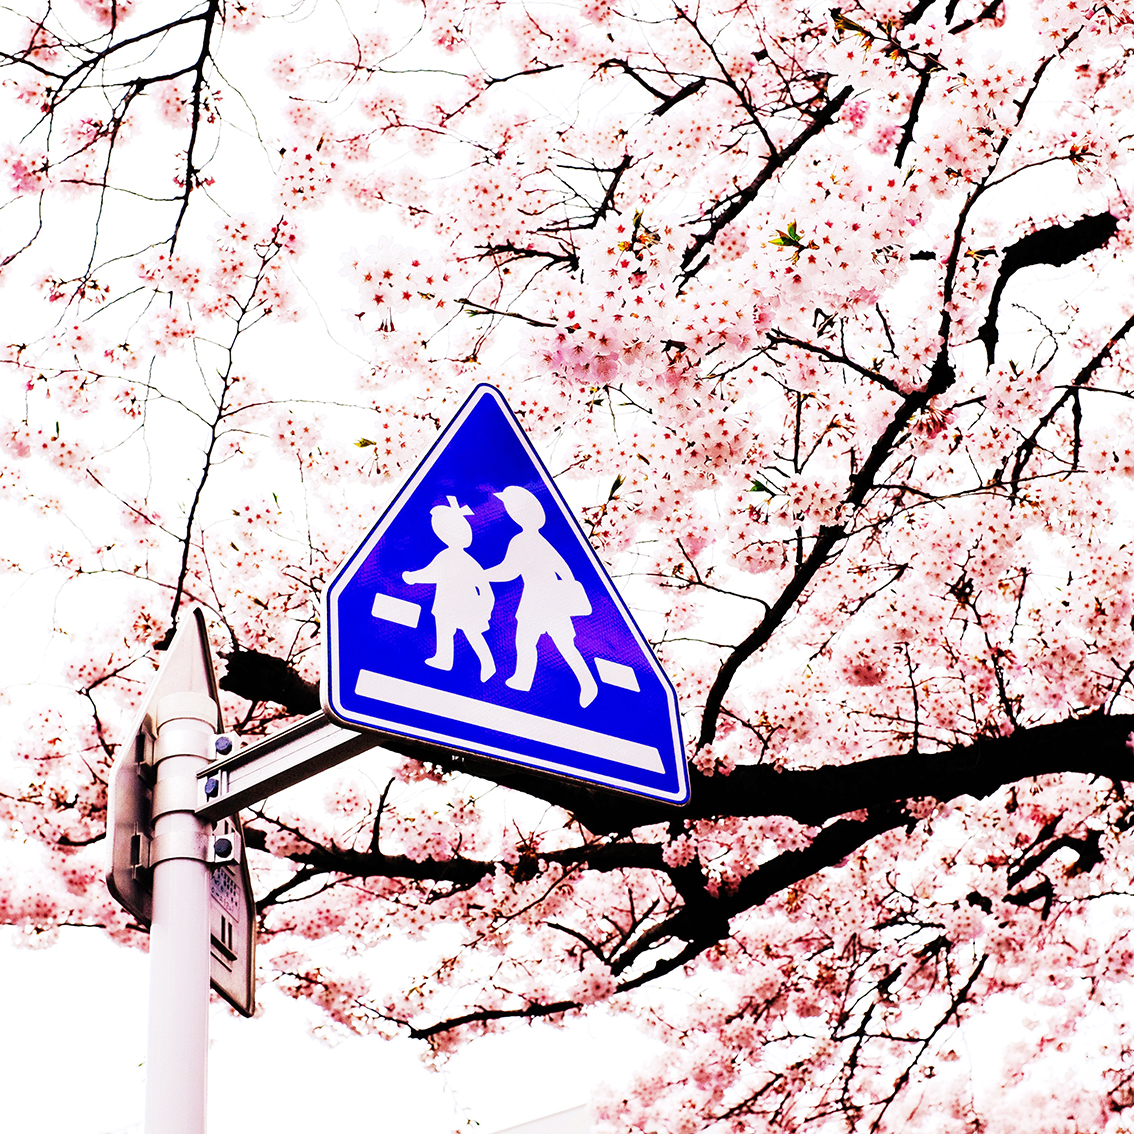 PedestrianSakura